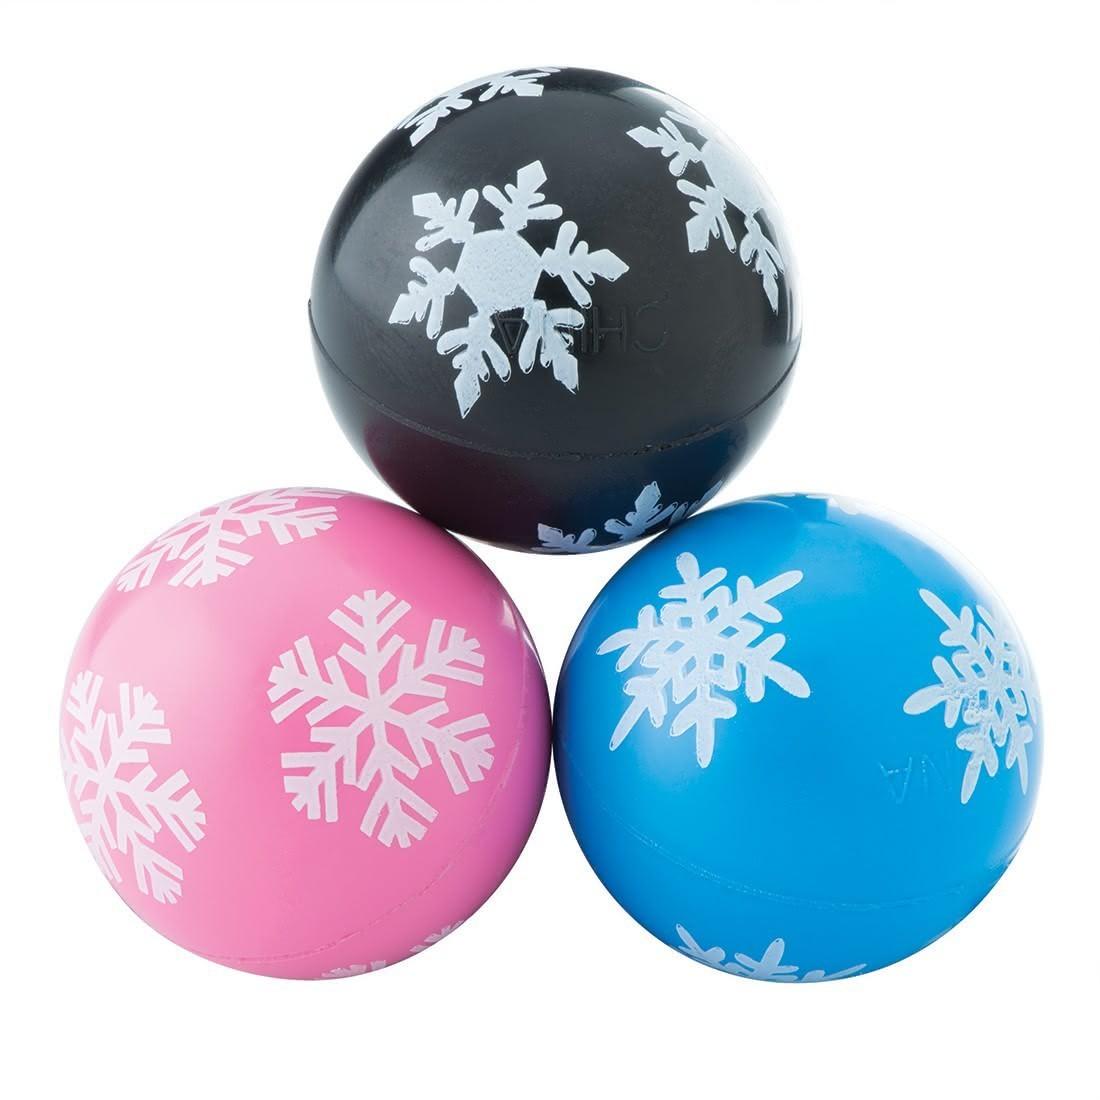 30mm Snowflake Bouncing Balls  [image]